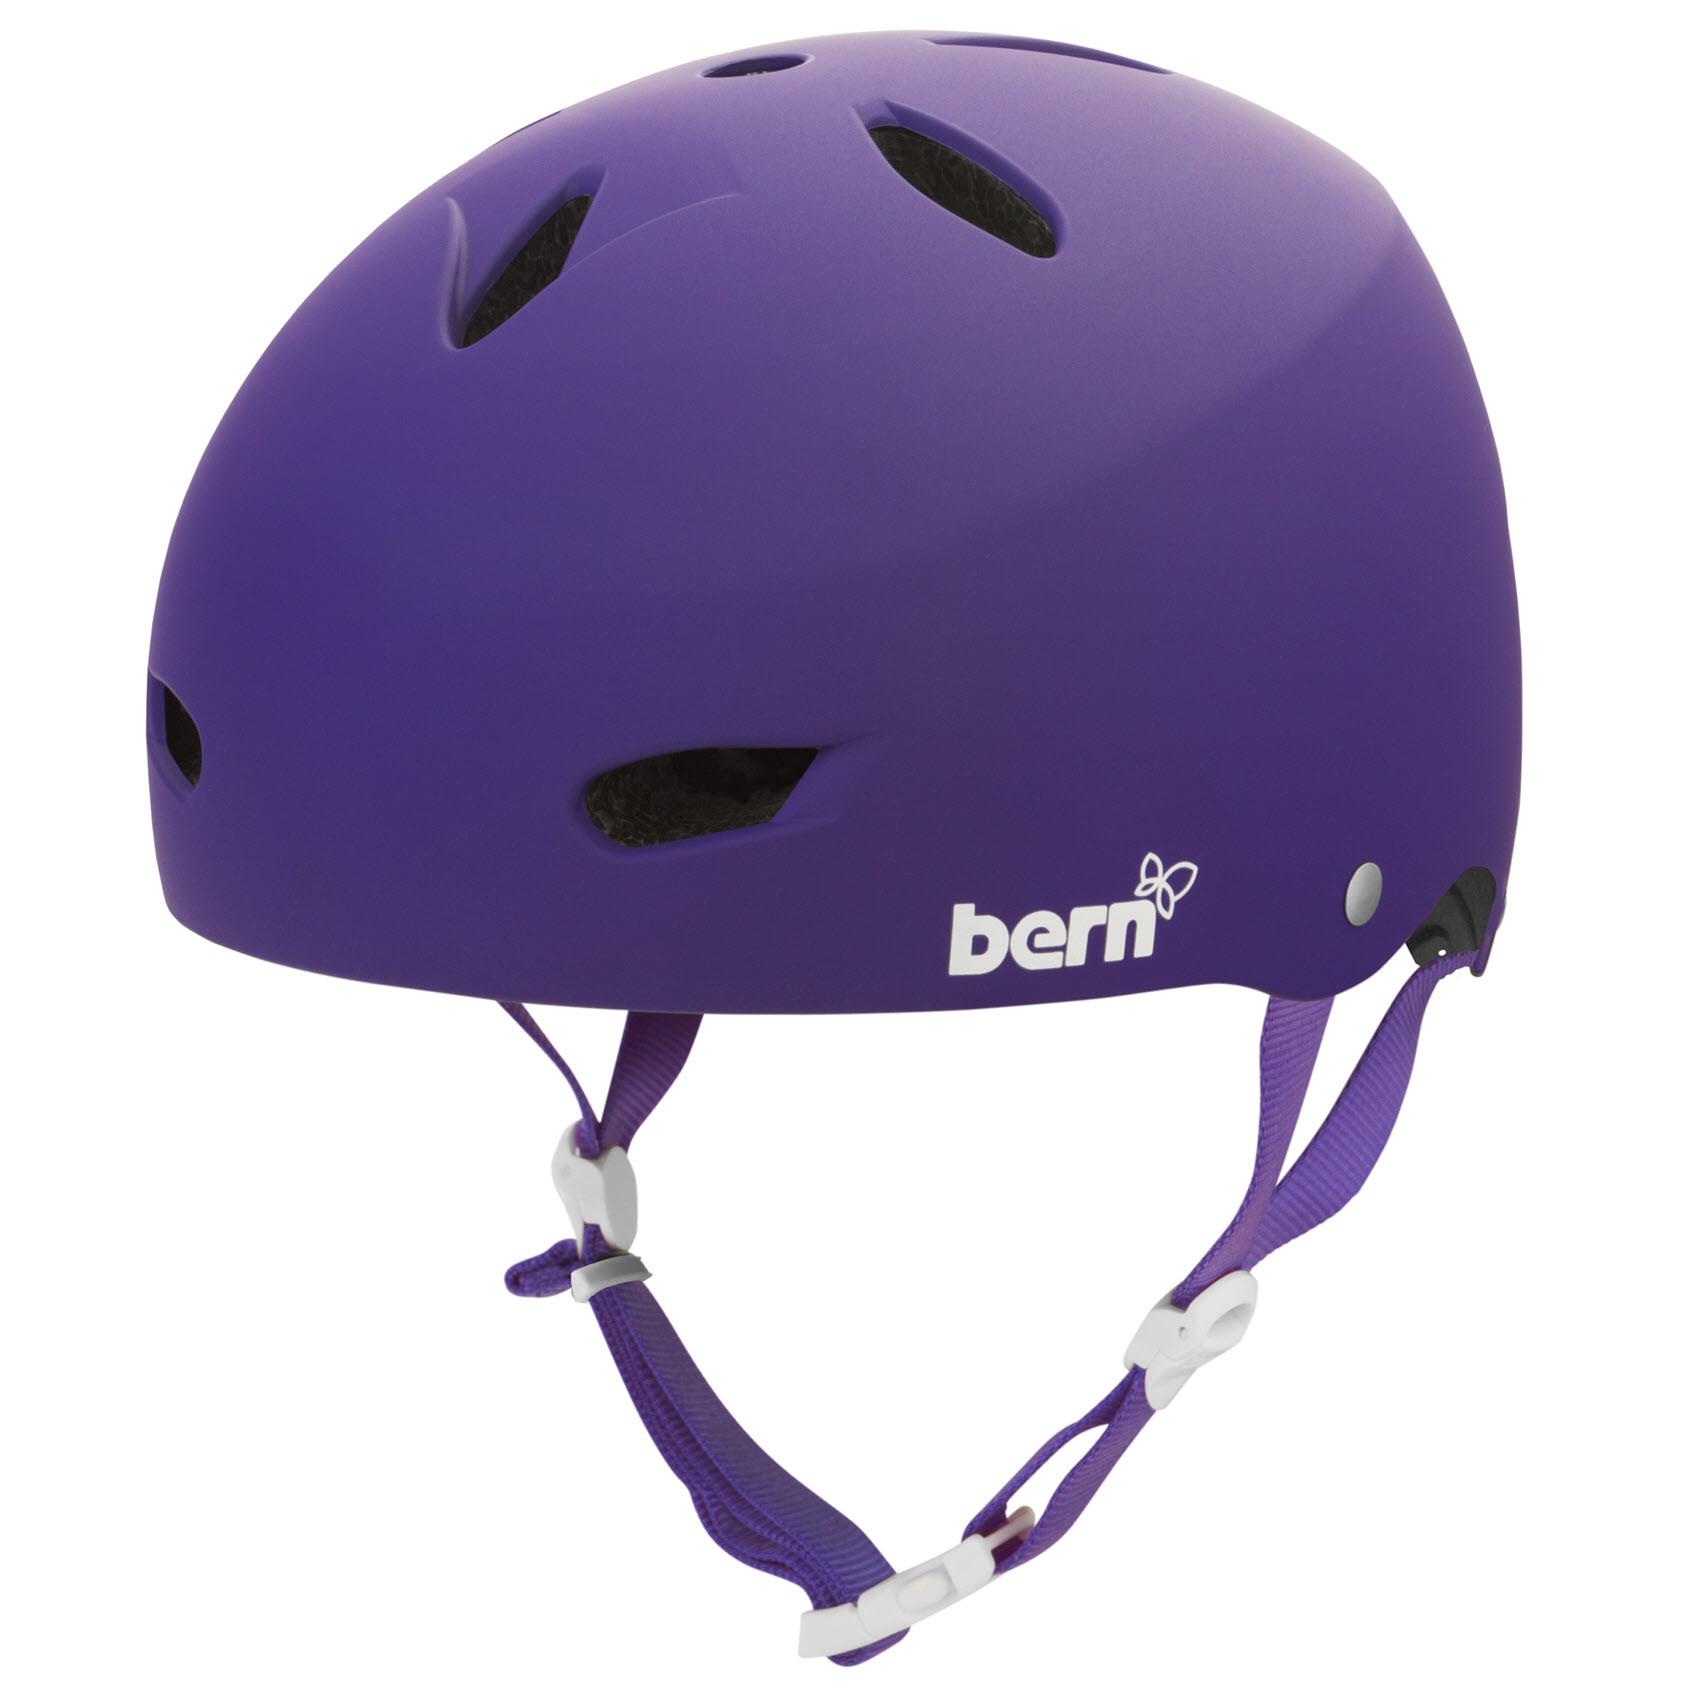 bern helmet bike brighton womens hard hat purple skate matte visor fixed medium